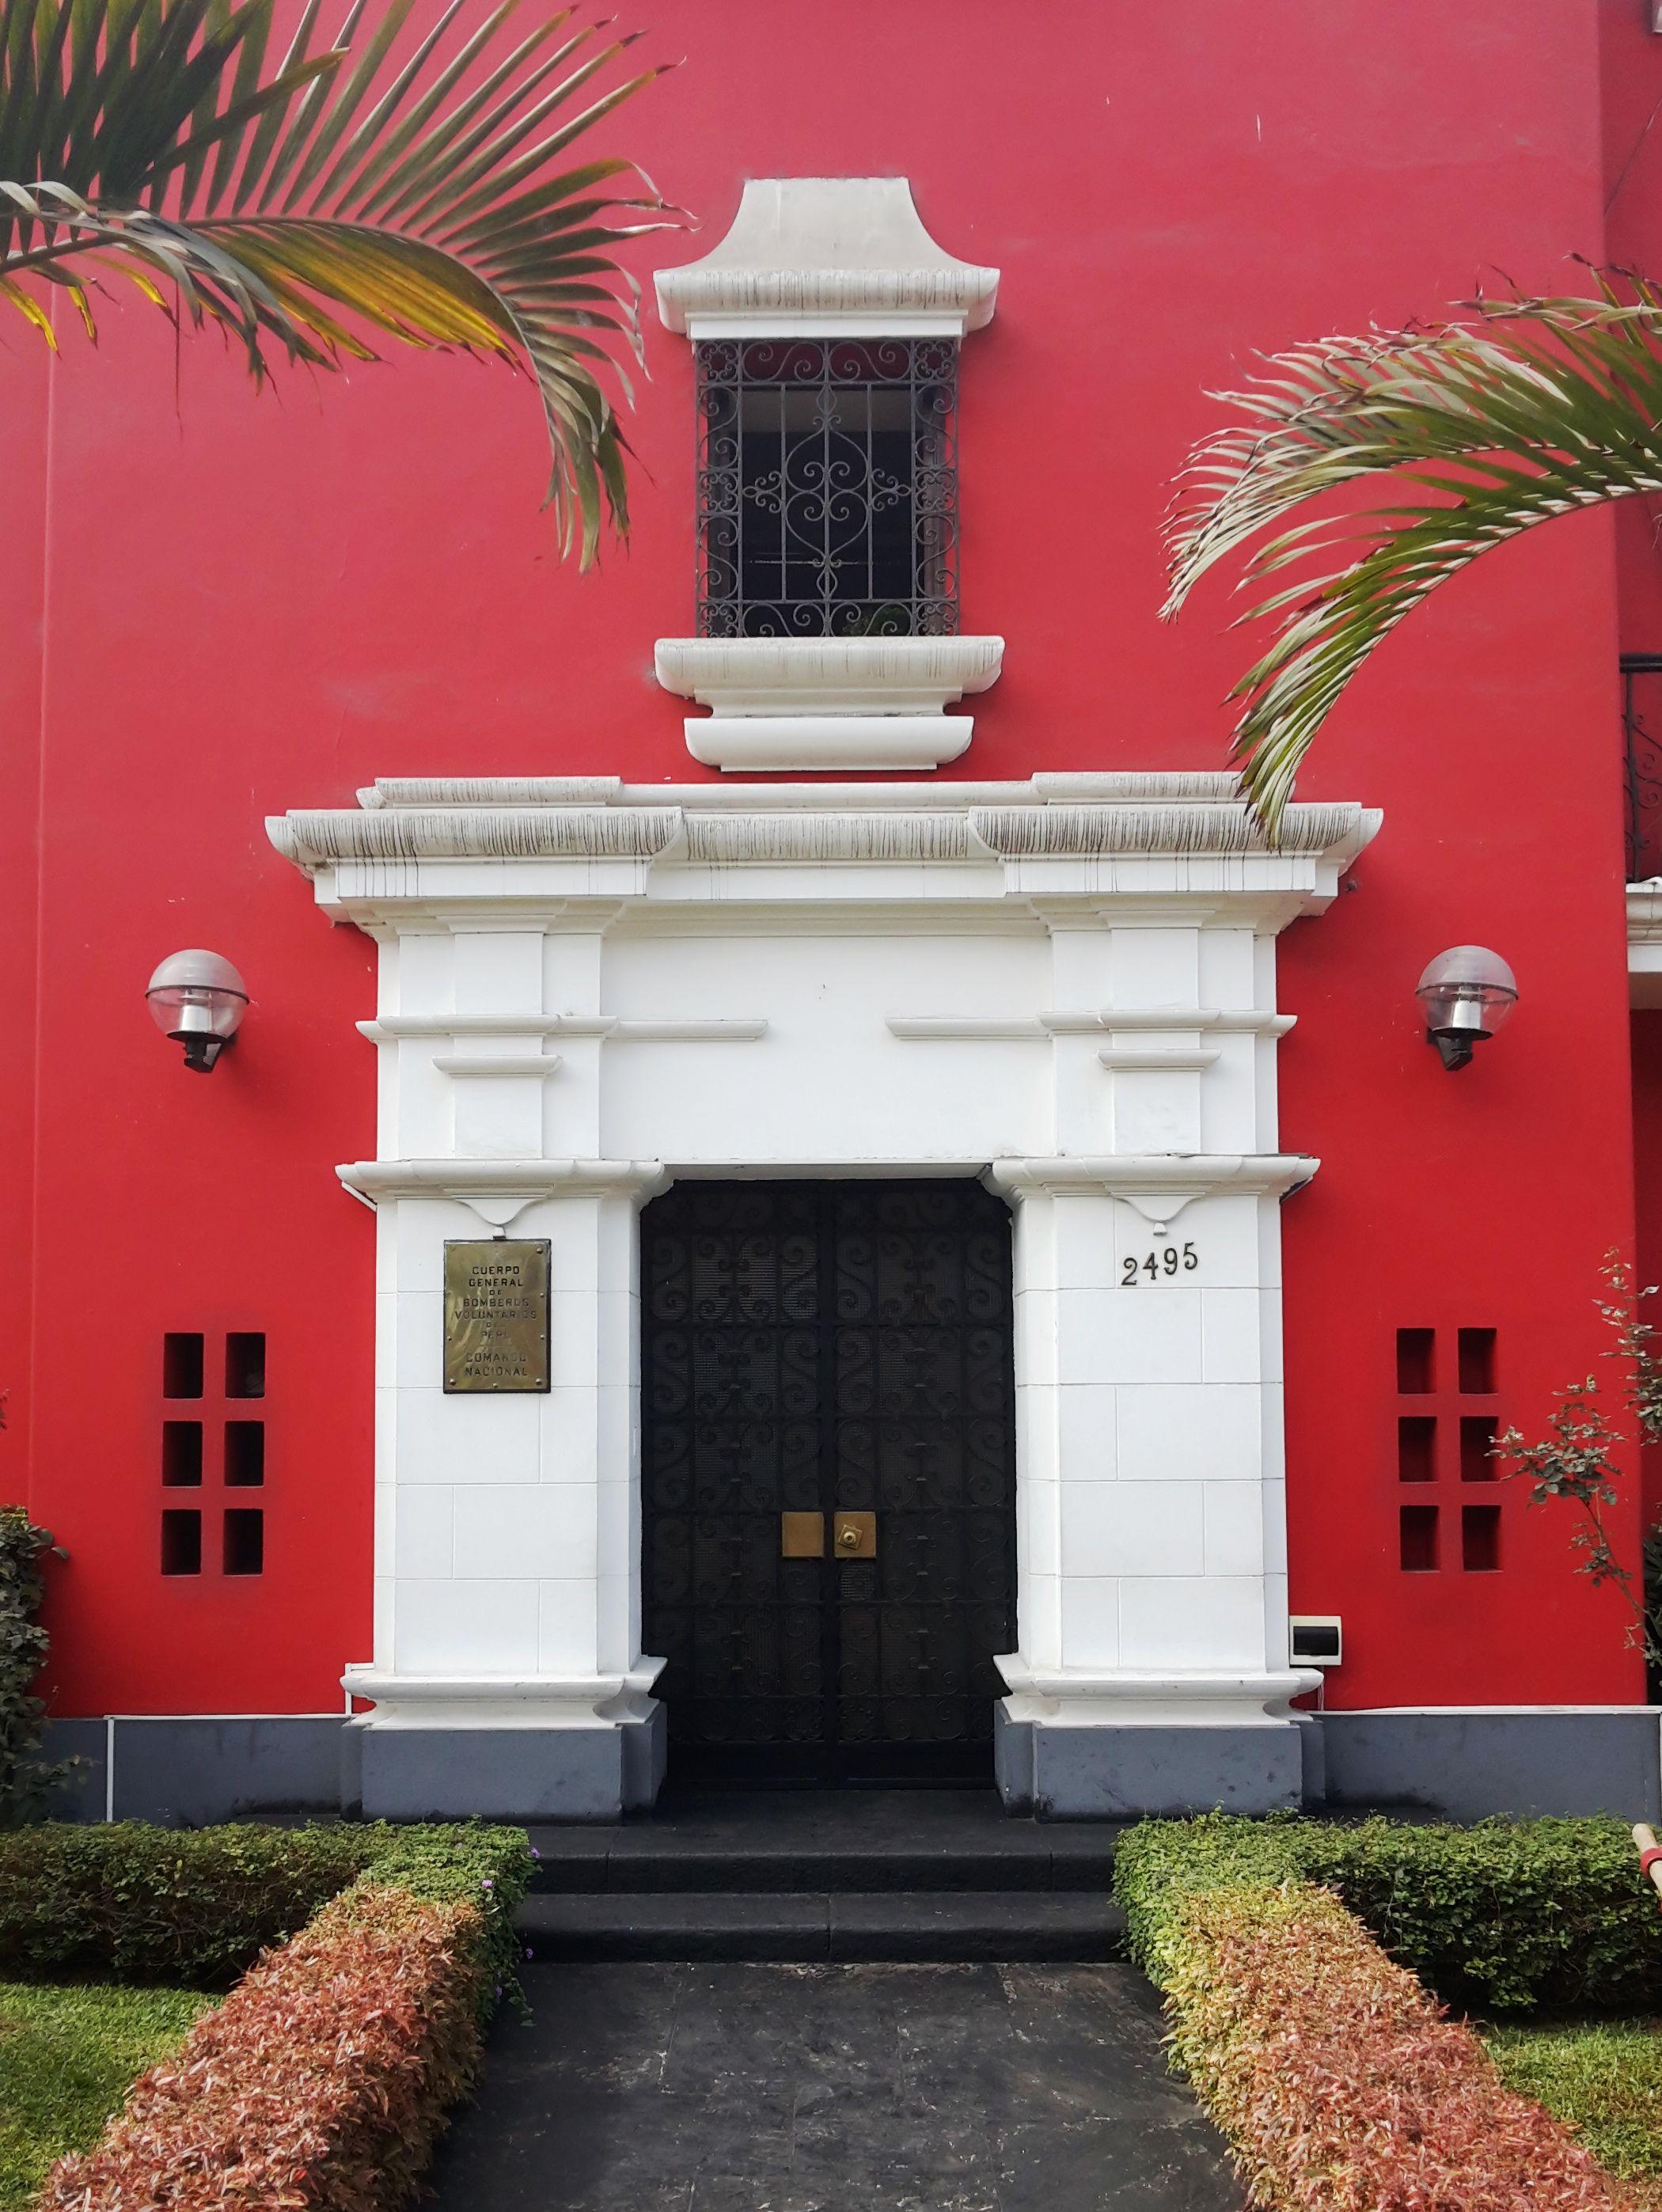 Felipe Salaverry Ave  2495 | San Isidro, Lima, Peru | PERU